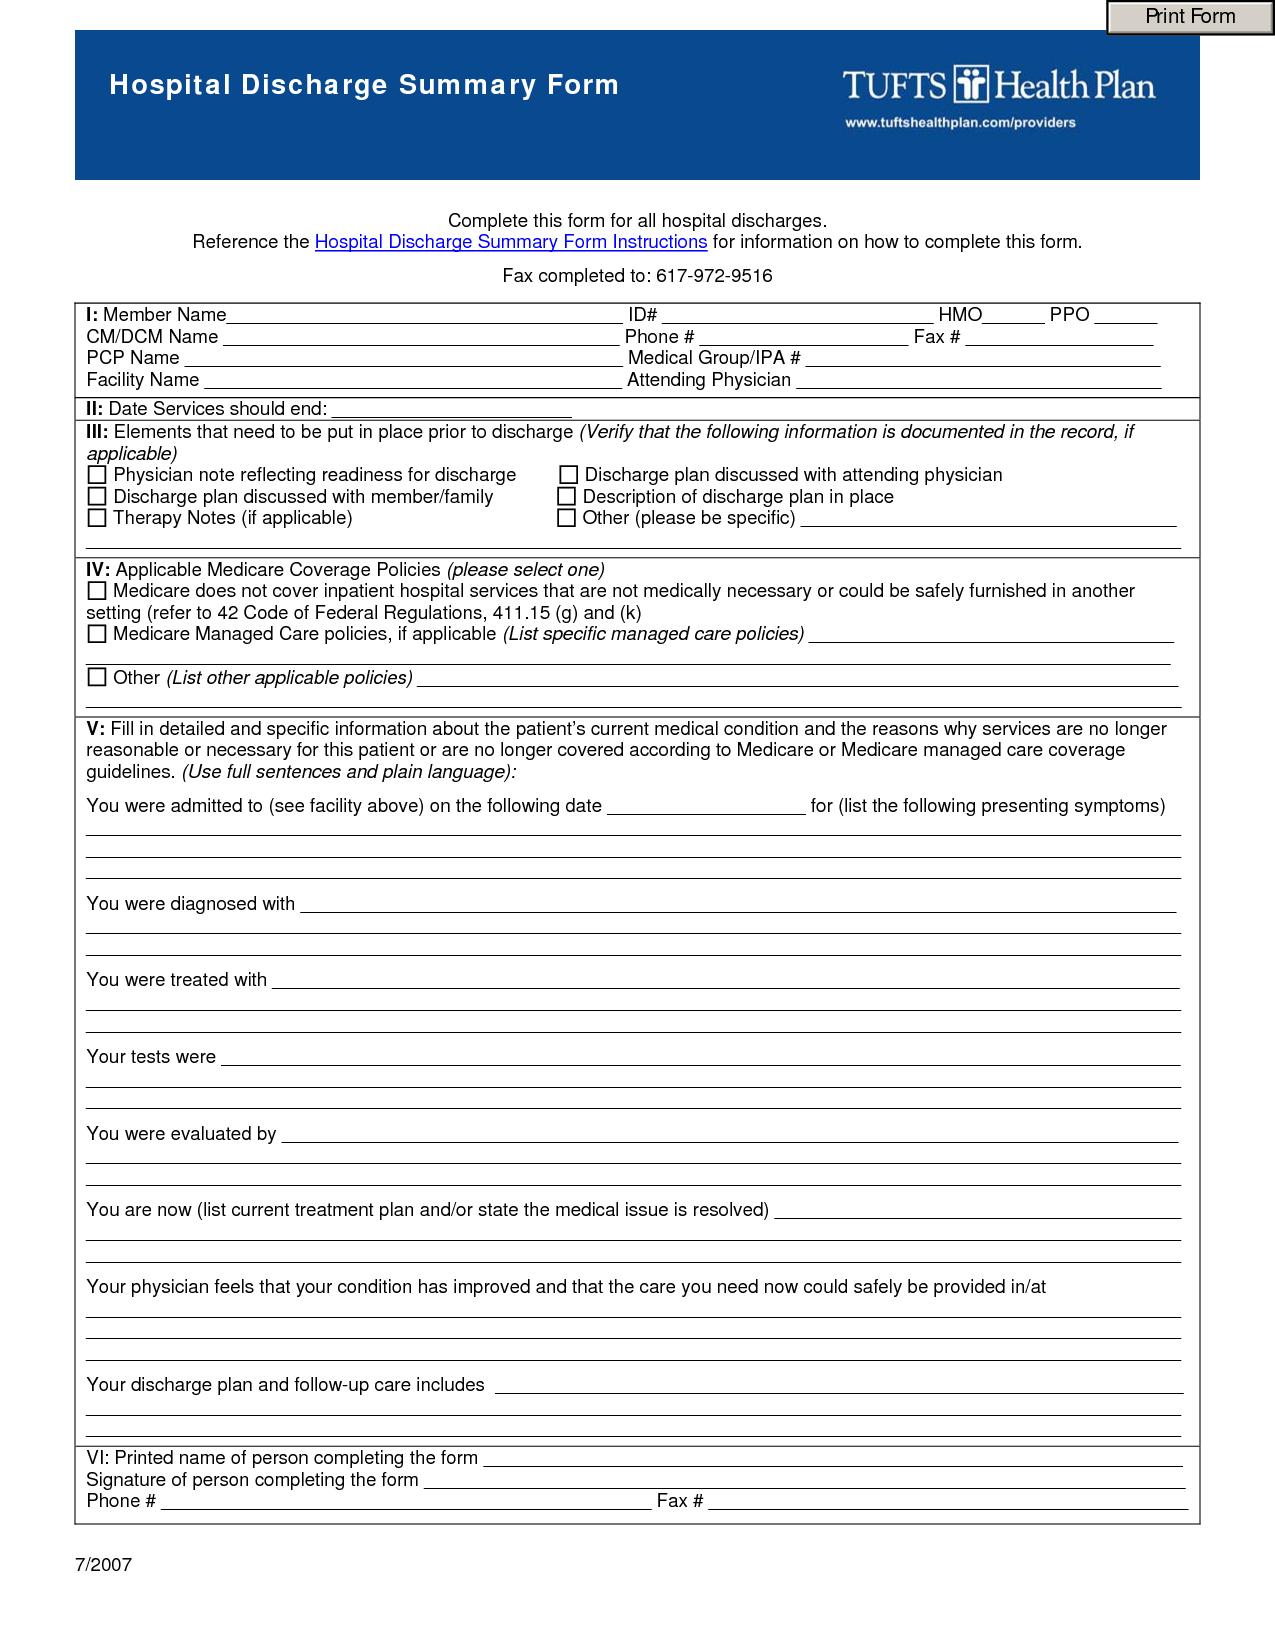 Sample Hospital Discharge Forms